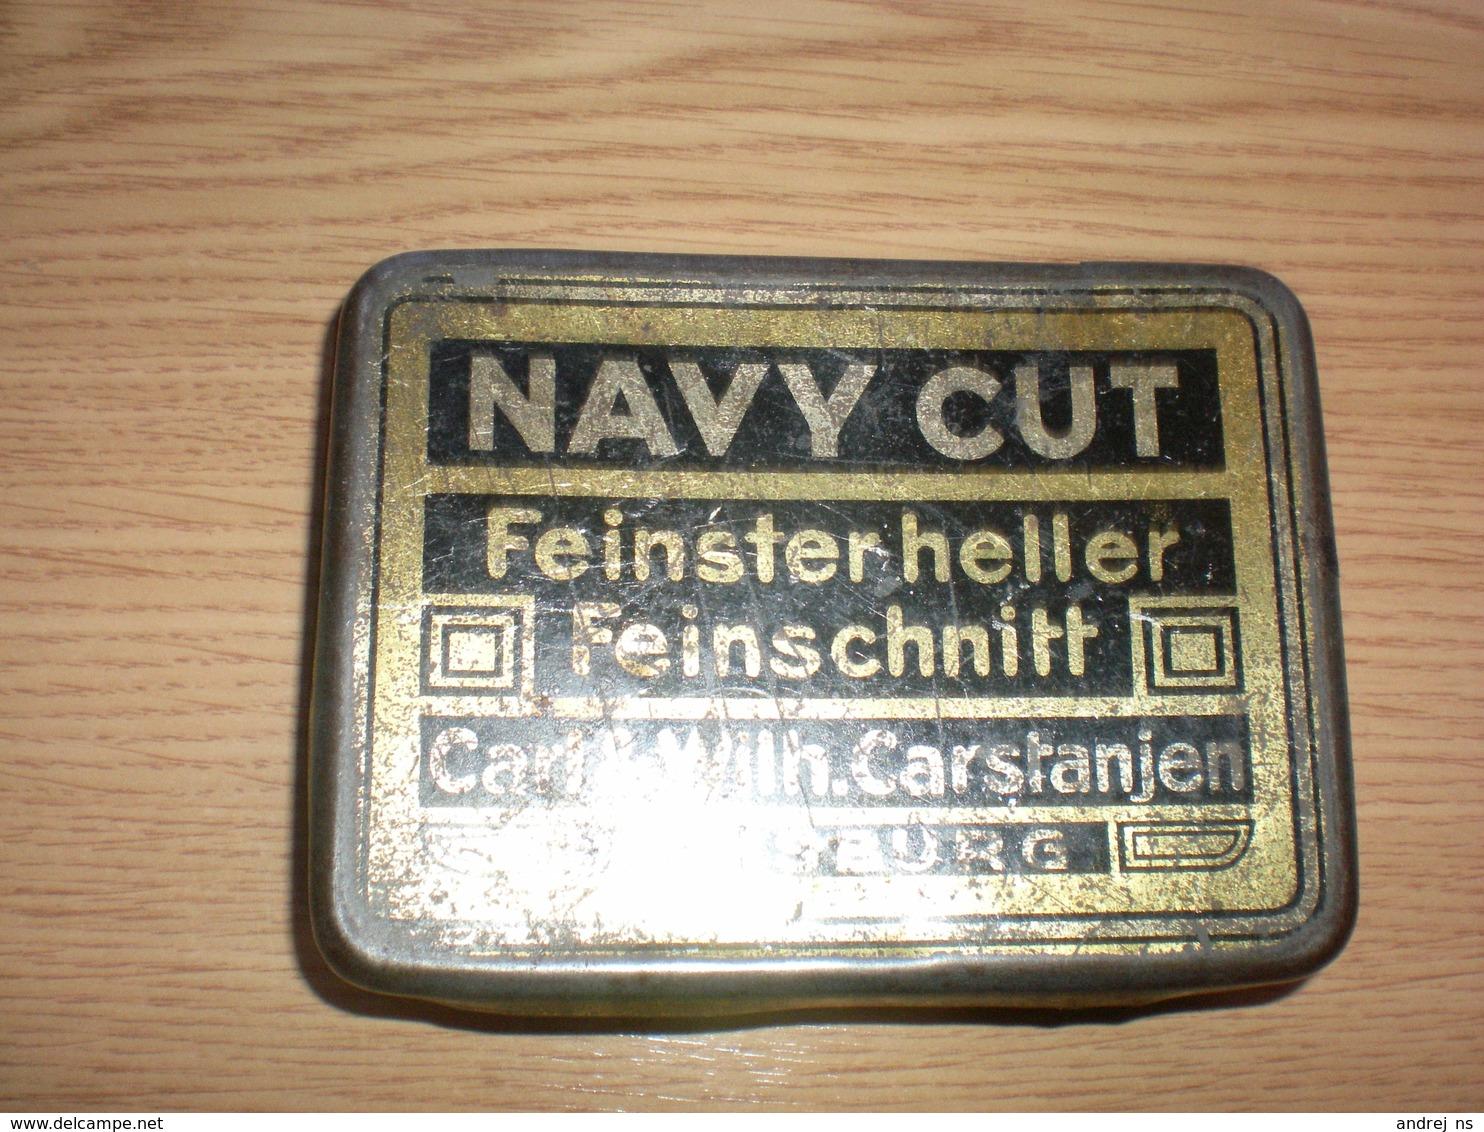 Old Tin Box Navy Cut Feinsterheller Feinschnitt Carl Wilh. Carstanjen Duisburg - Schnupftabakdosen (leer)